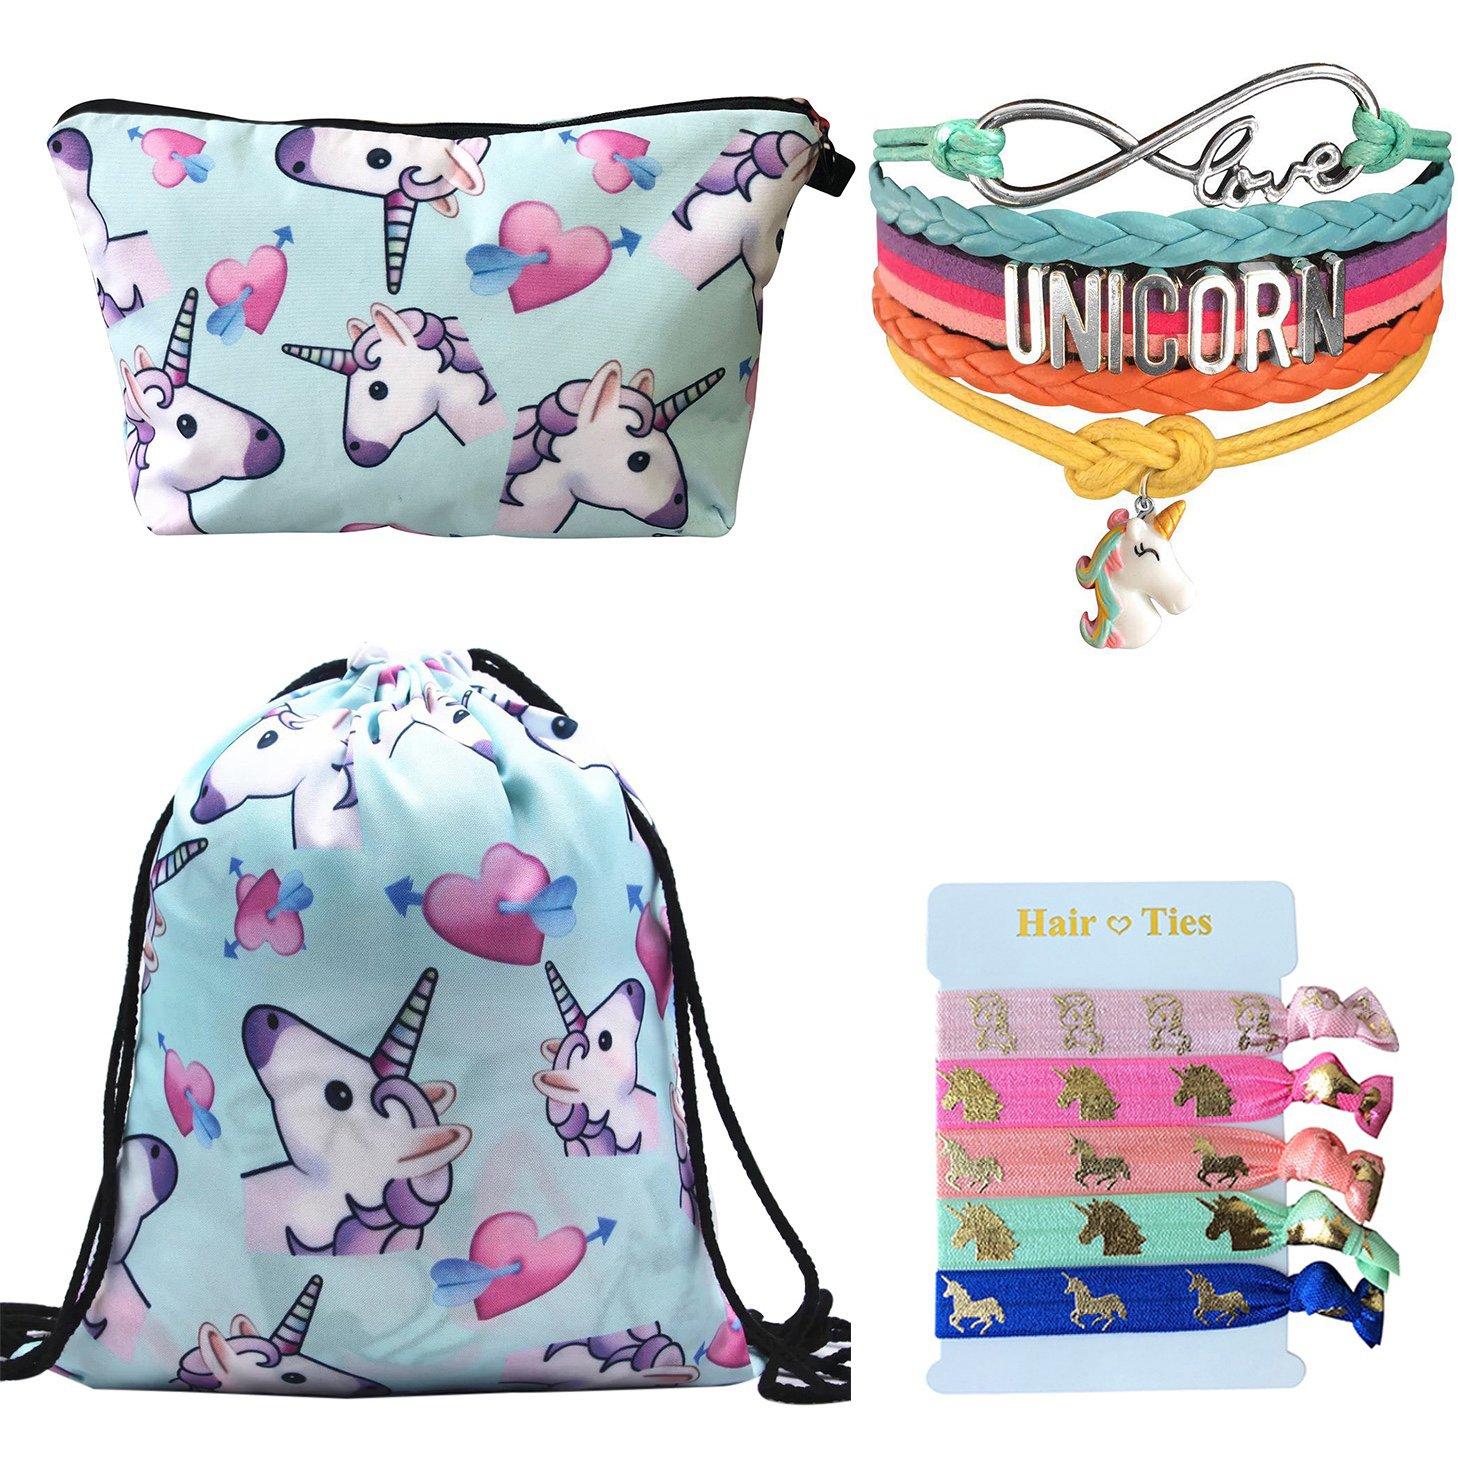 Unicorn Gifts 4 Pack - Unicorn Drawstring Backpack/Makeup Bag/Rainbow Bracelet/Hair Tie (Blue 2)